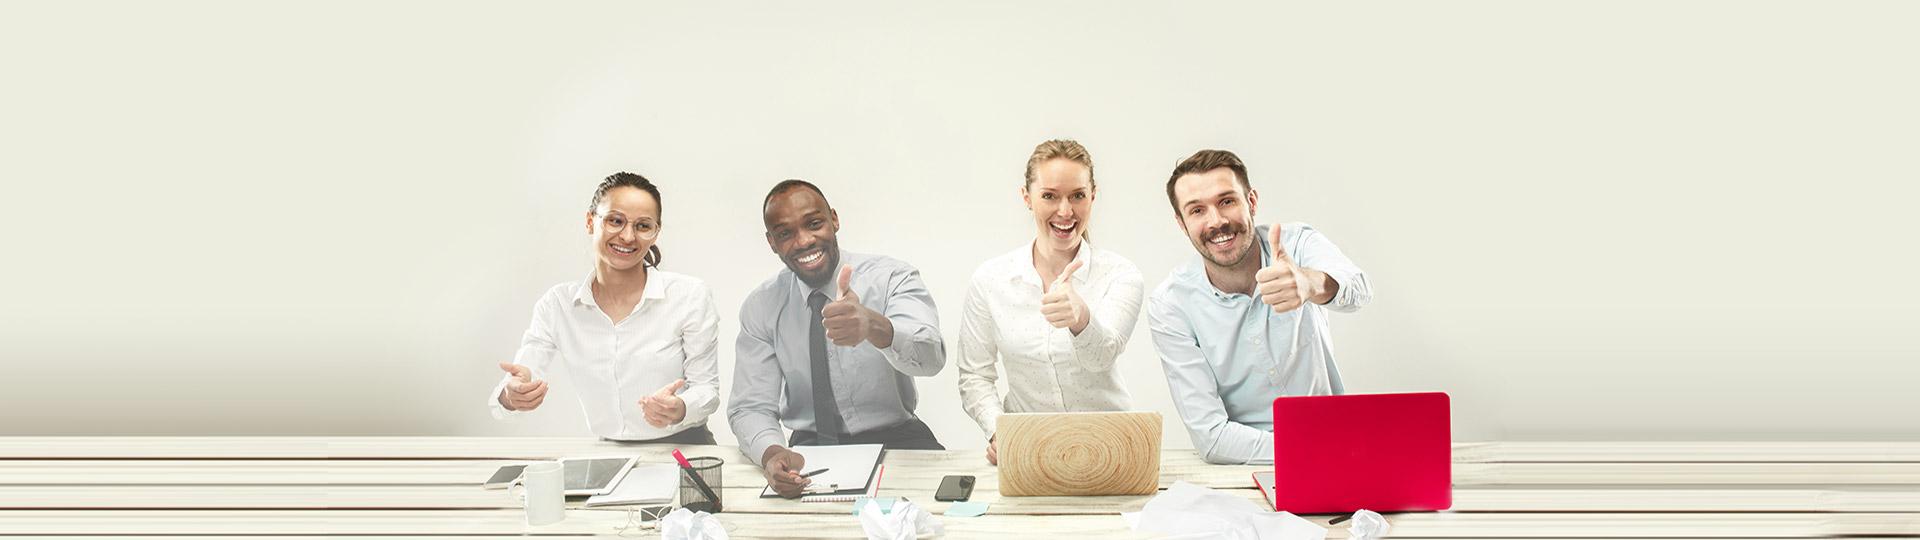 customer satisfaction survey: be successful